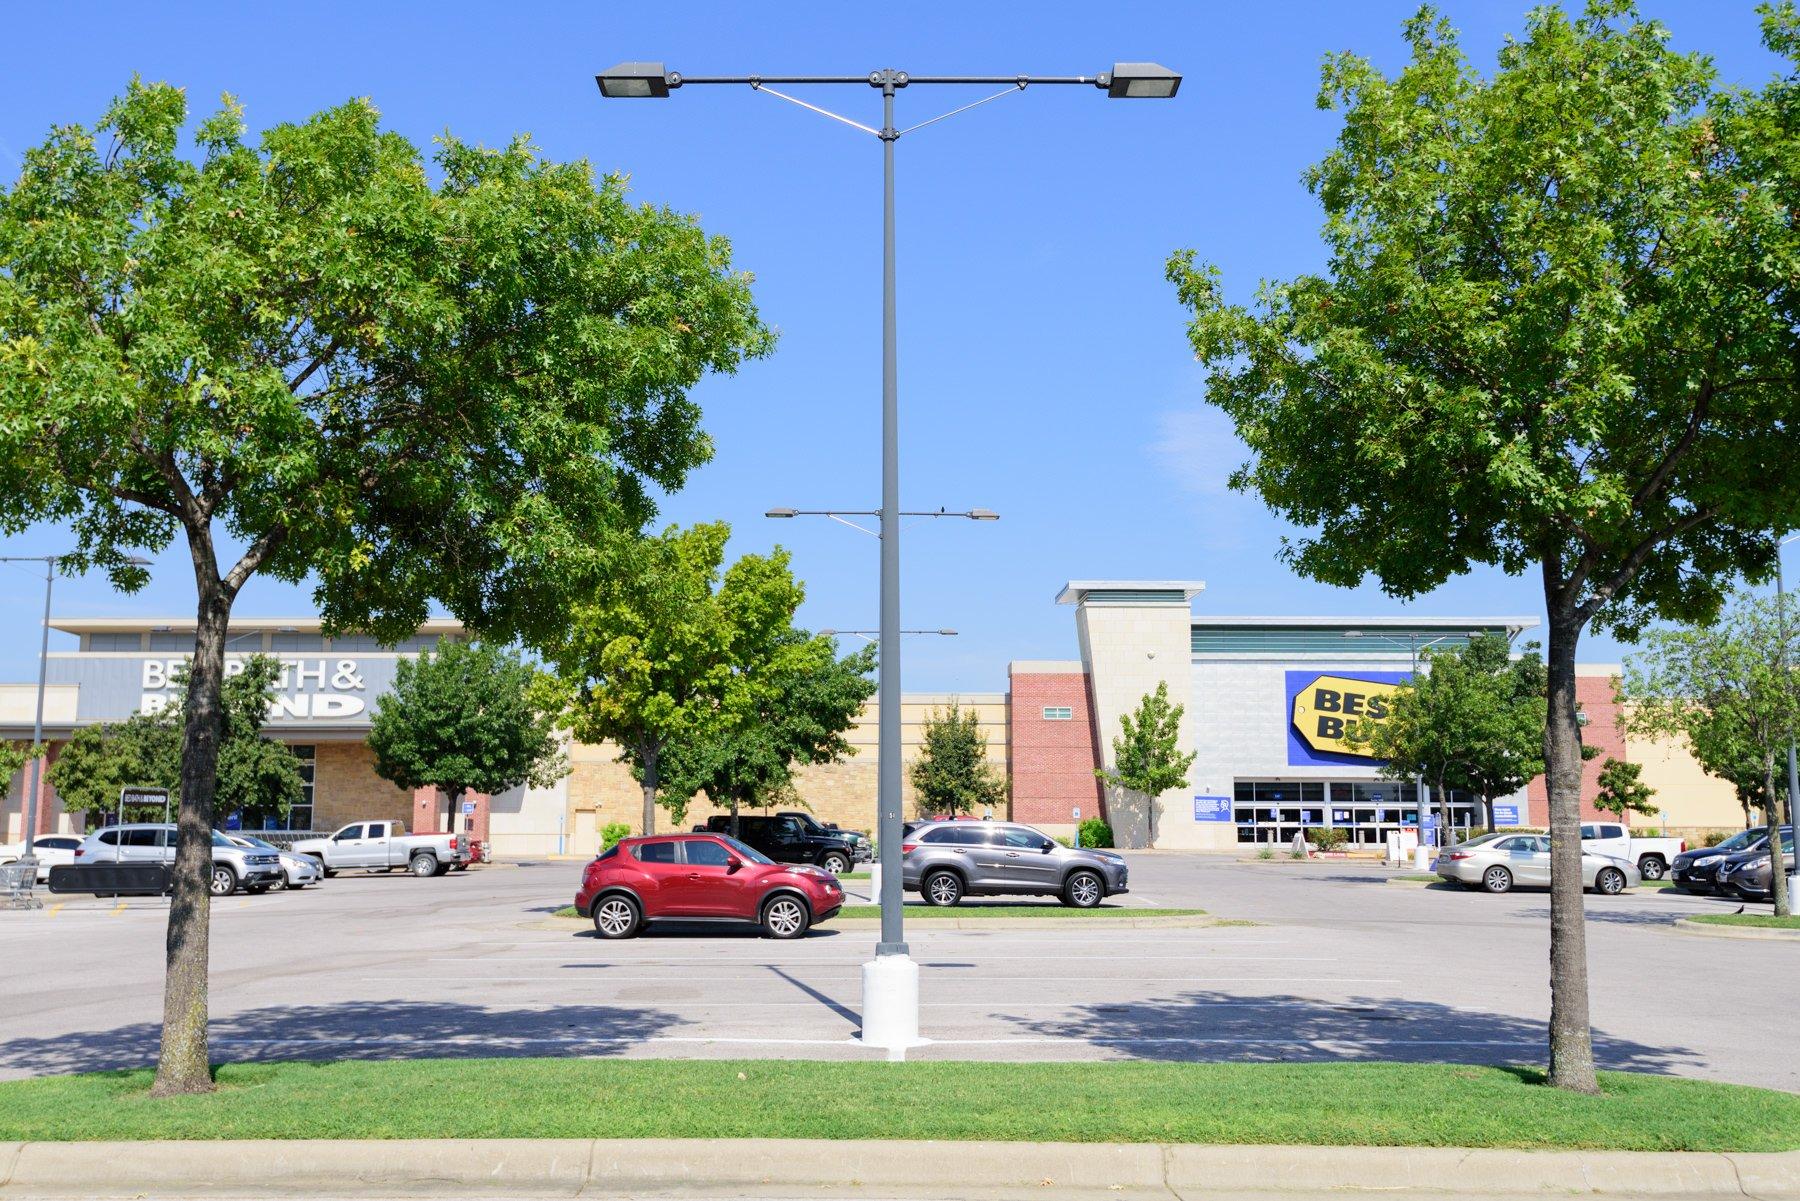 commercial-landscape-shopping center-parking lot-plants-trees